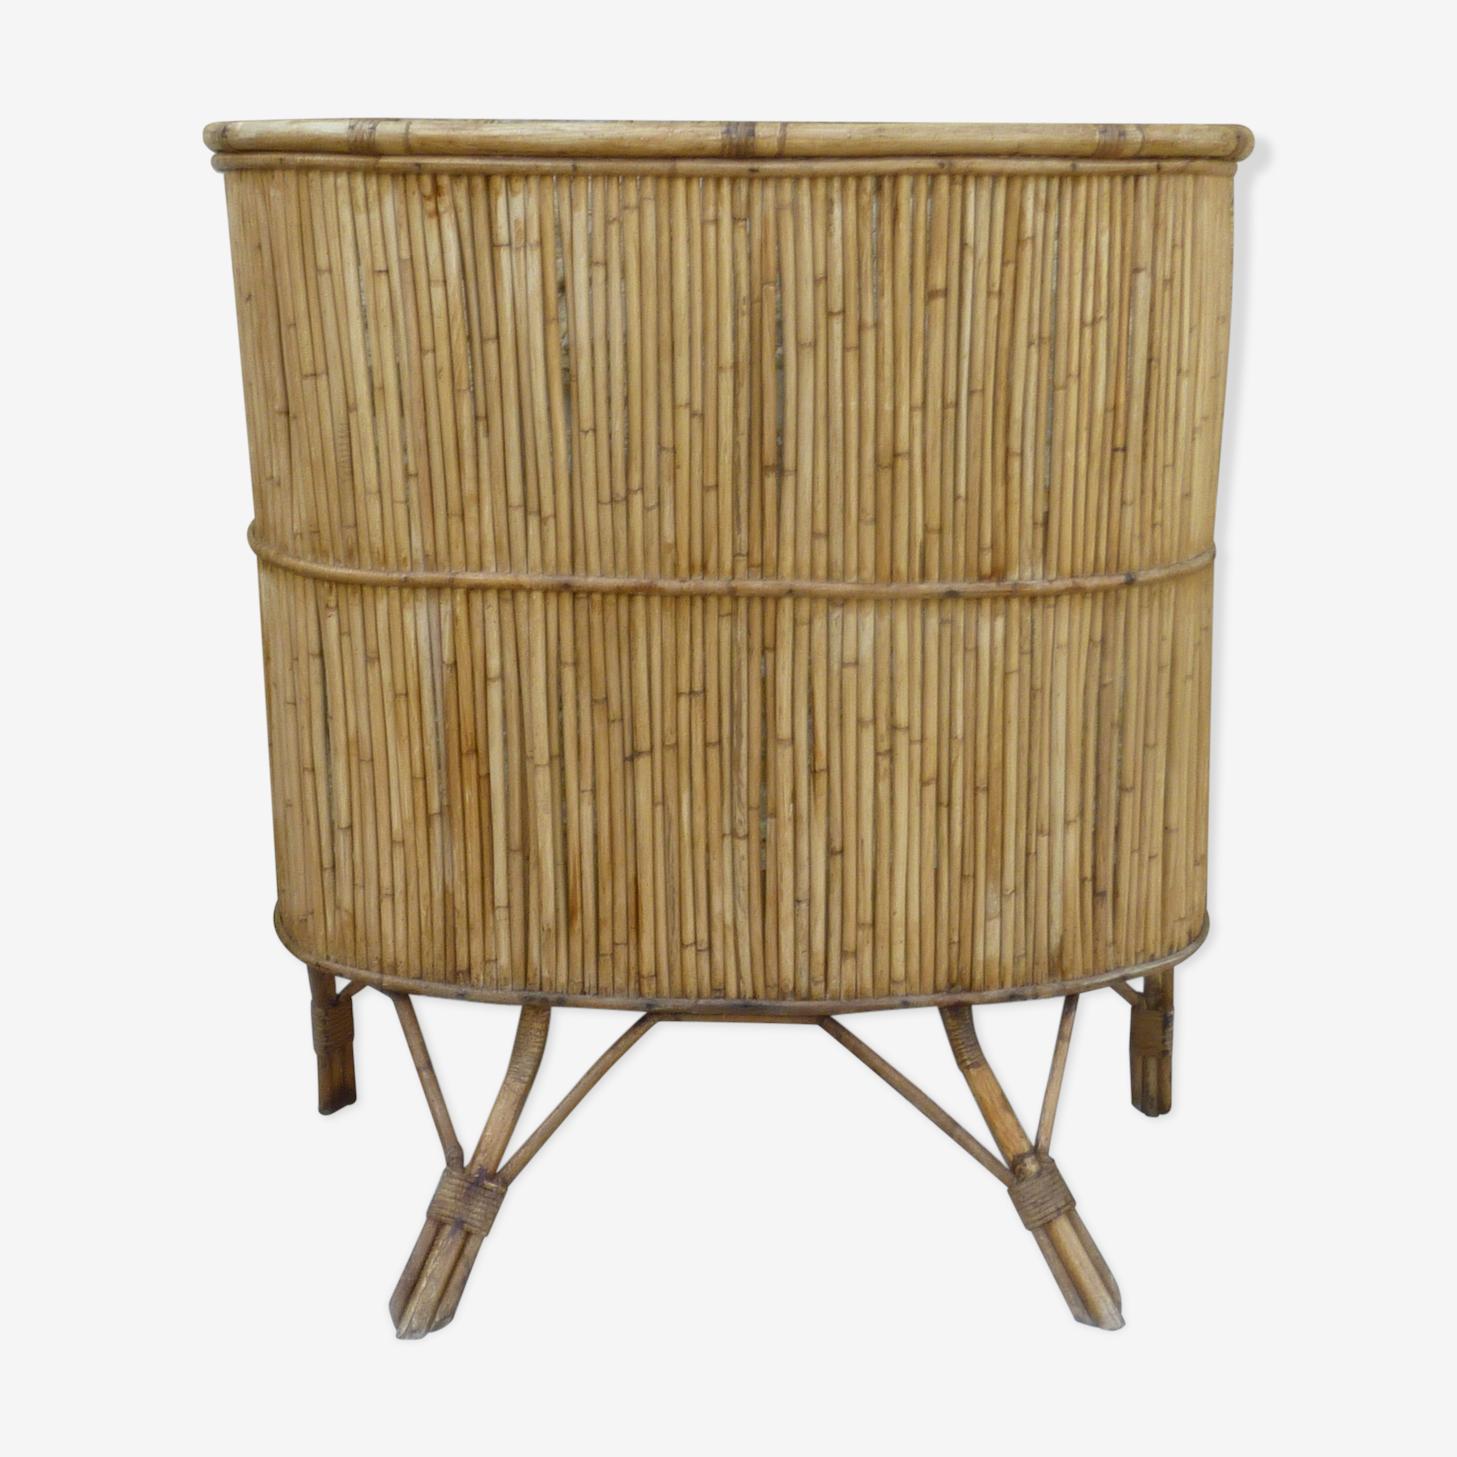 The 1960s rattan bar